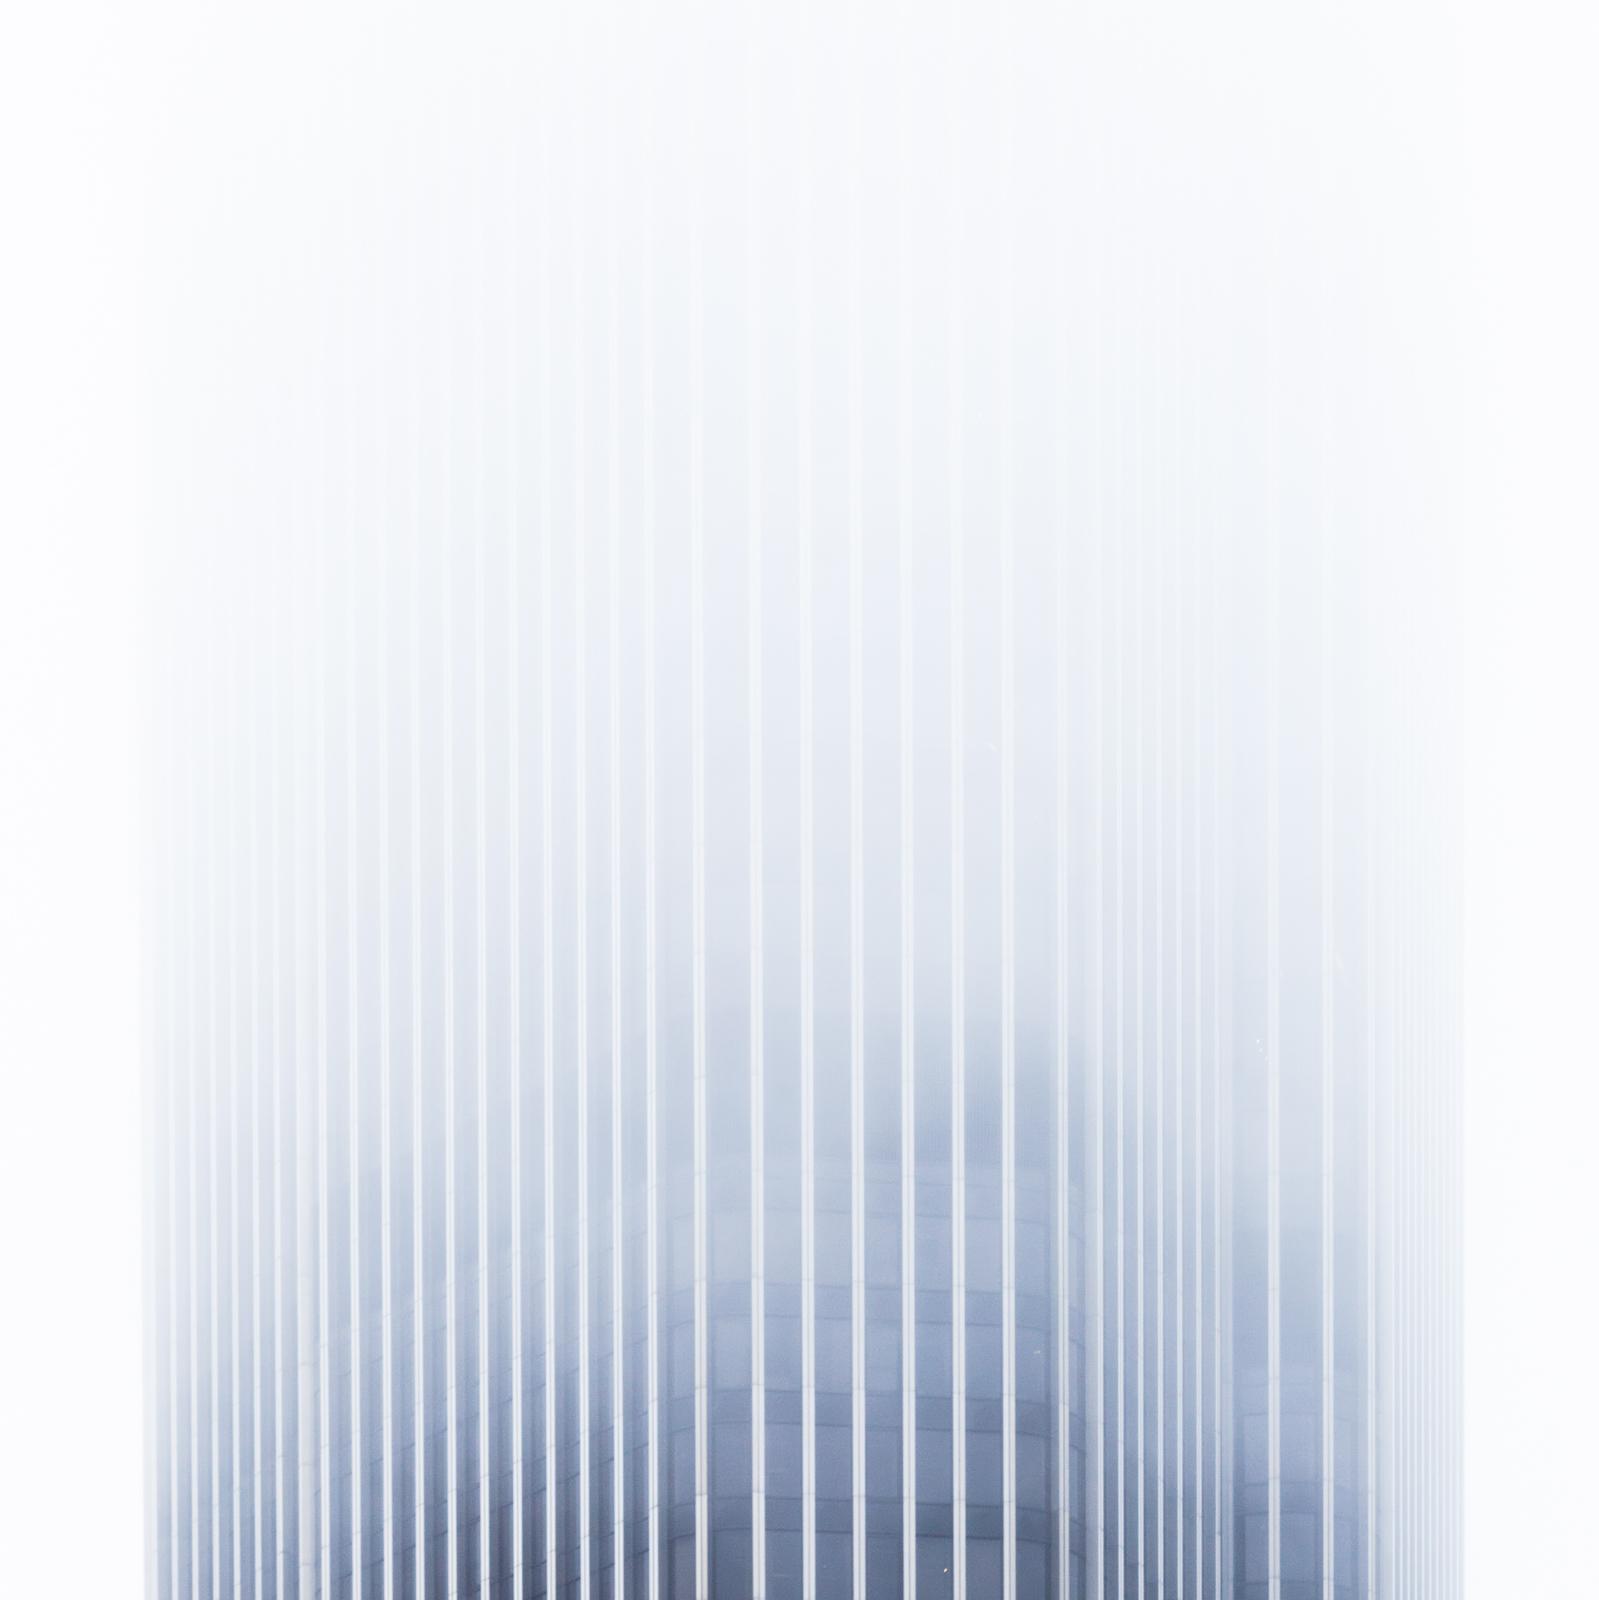 04@2x.jpg